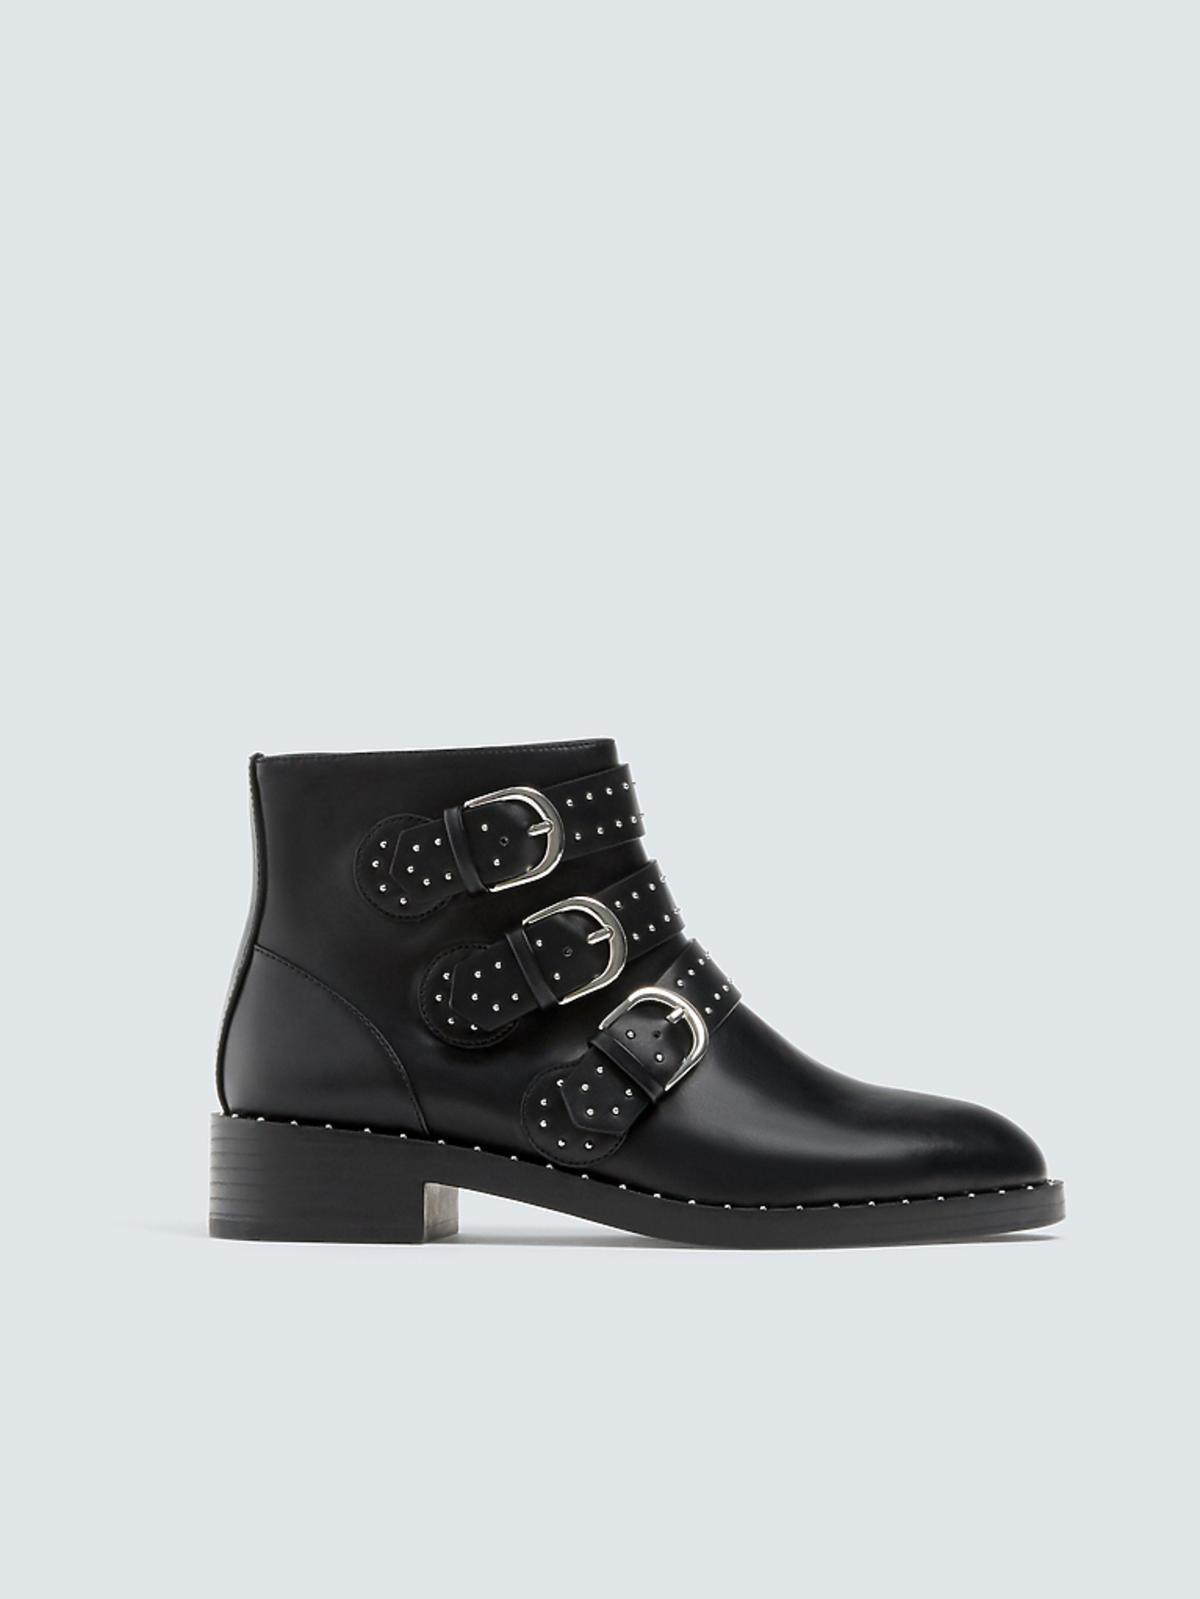 buty rockowe z klamrami Pull&Bear